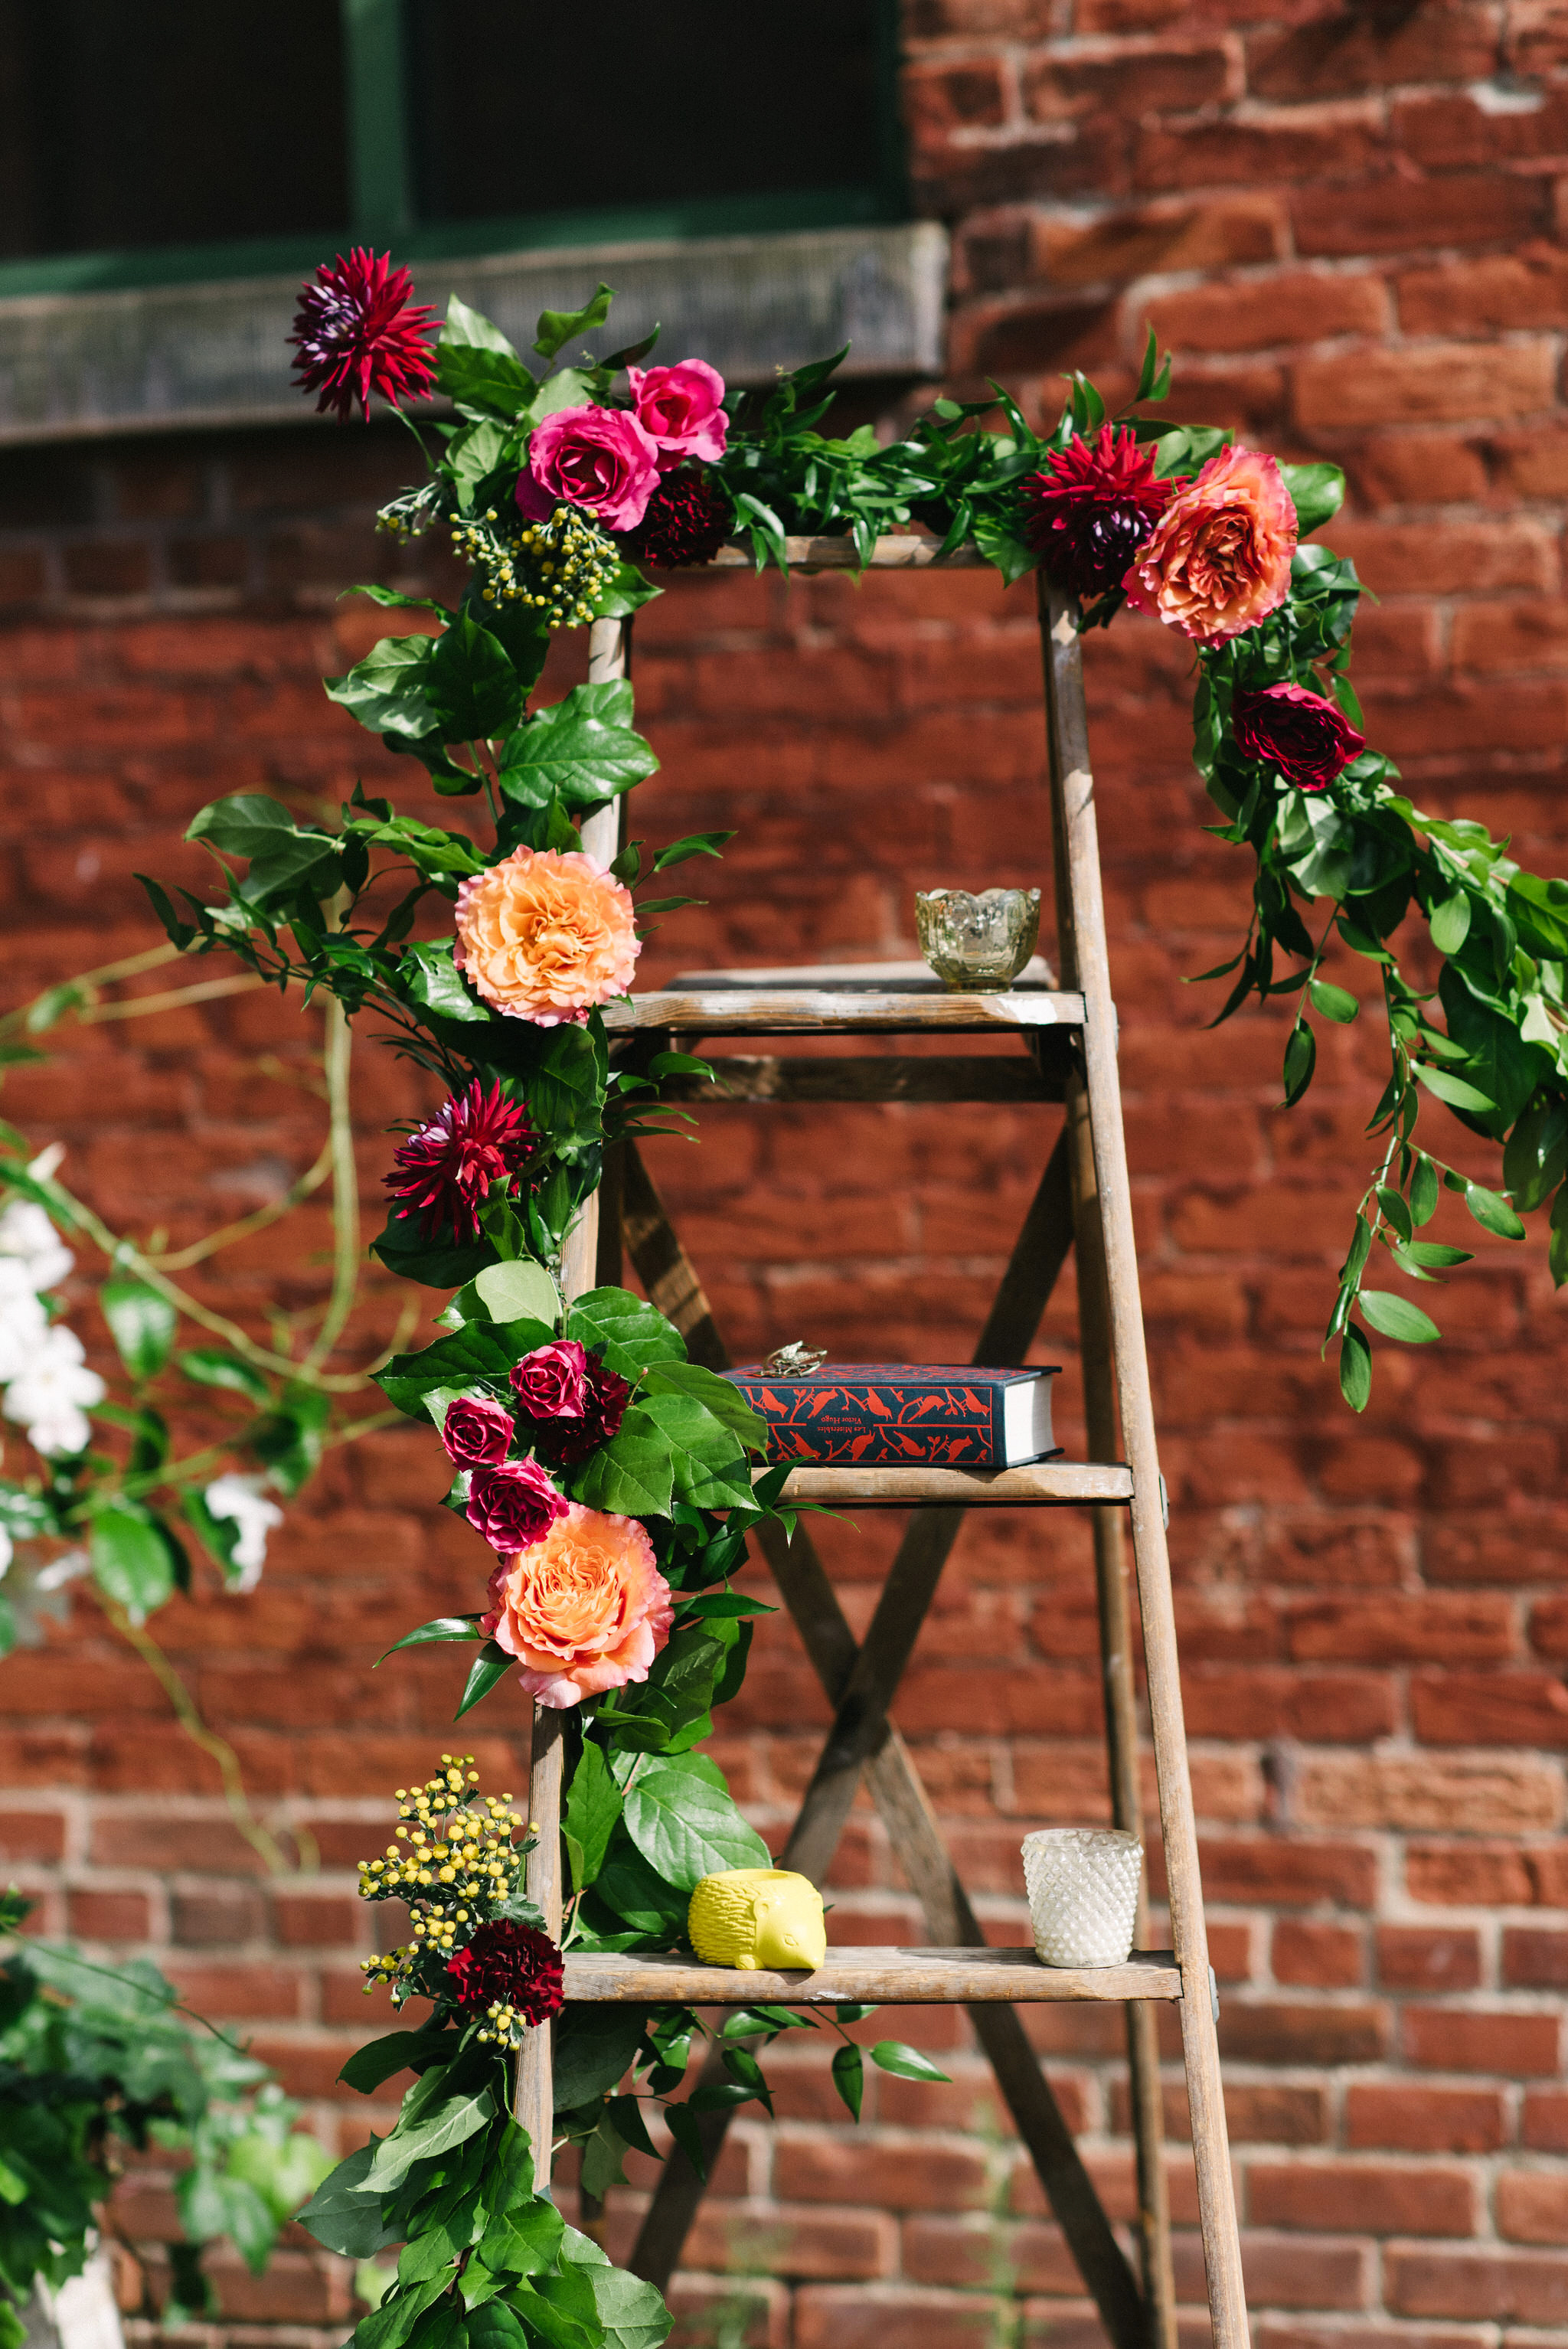 steph tim wedding ceremony ladder brick and flowers backdrop